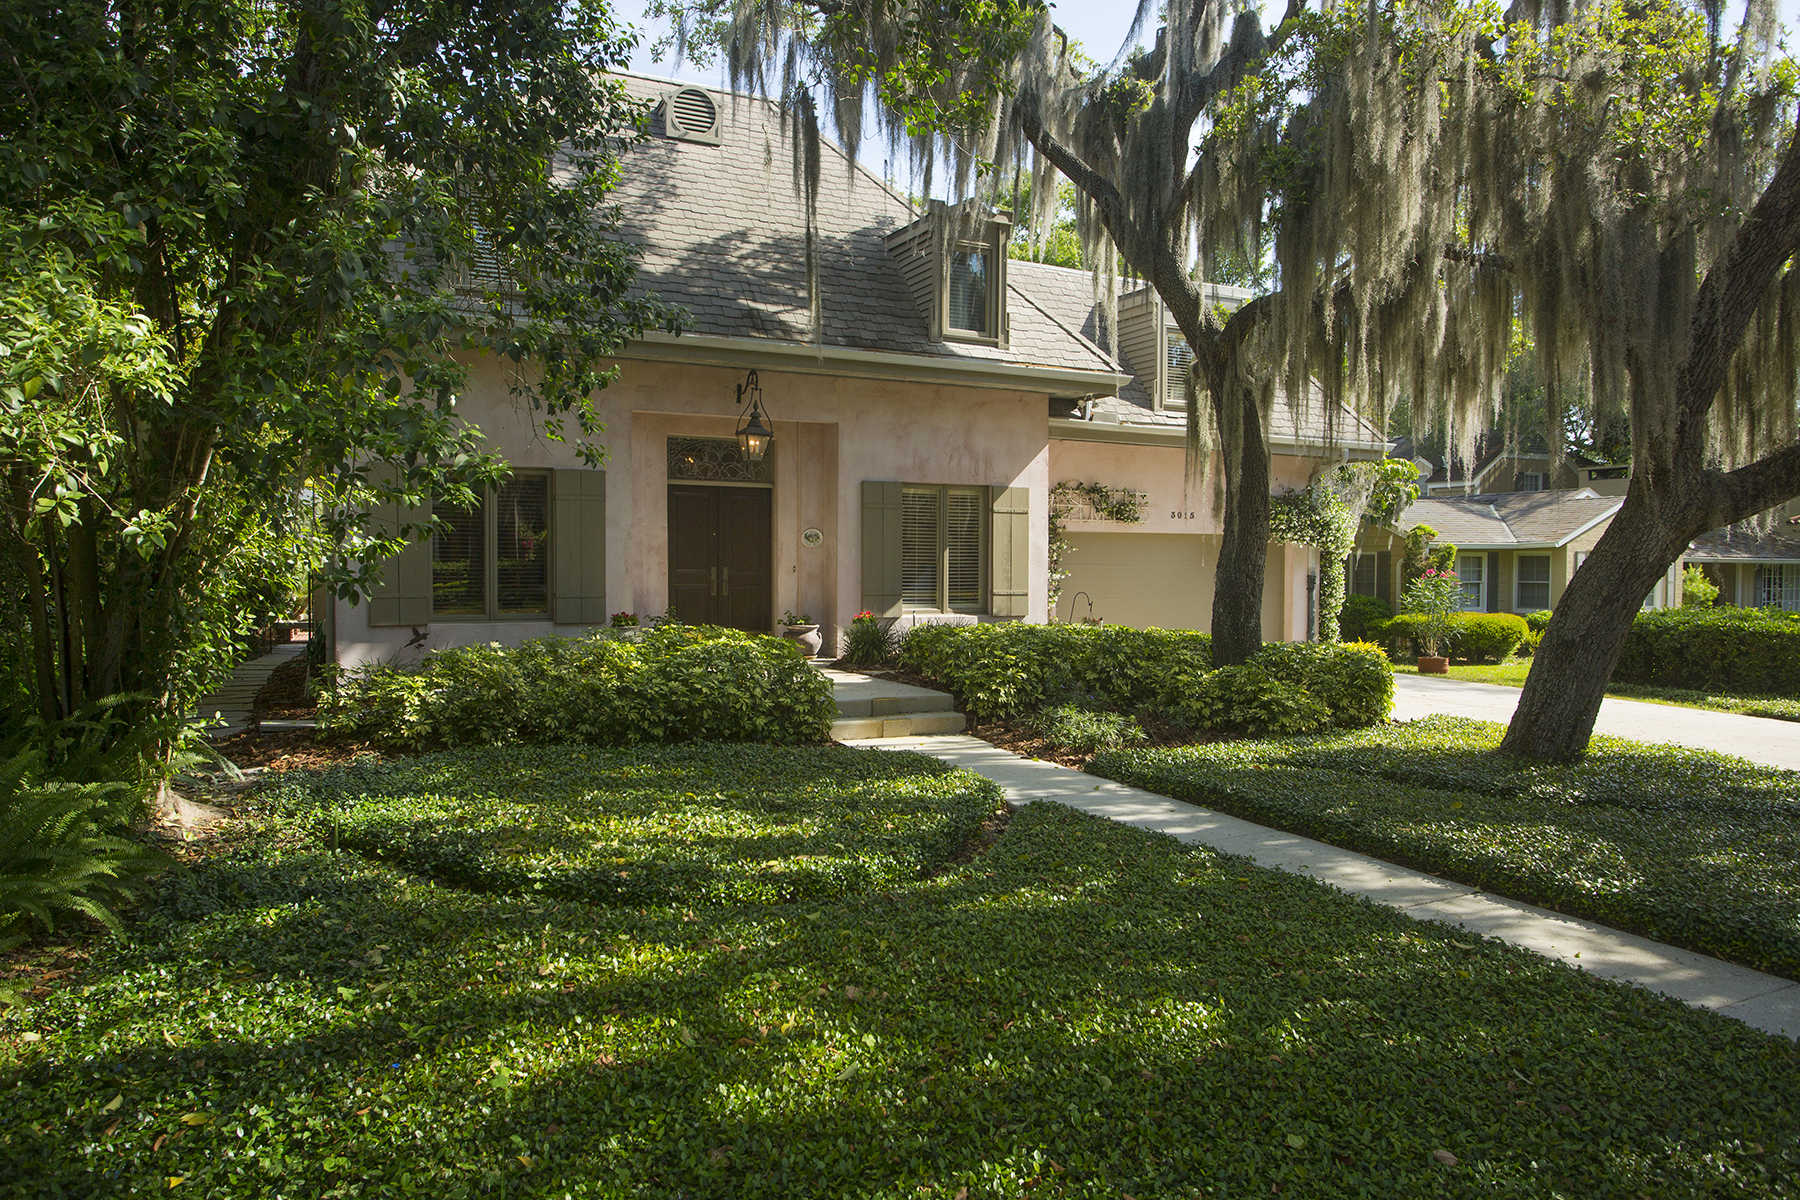 獨棟家庭住宅 為 出售 在 SOUTH TAMPA 3015 W Villa Rosa Tampa, 佛羅里達州 33611 美國